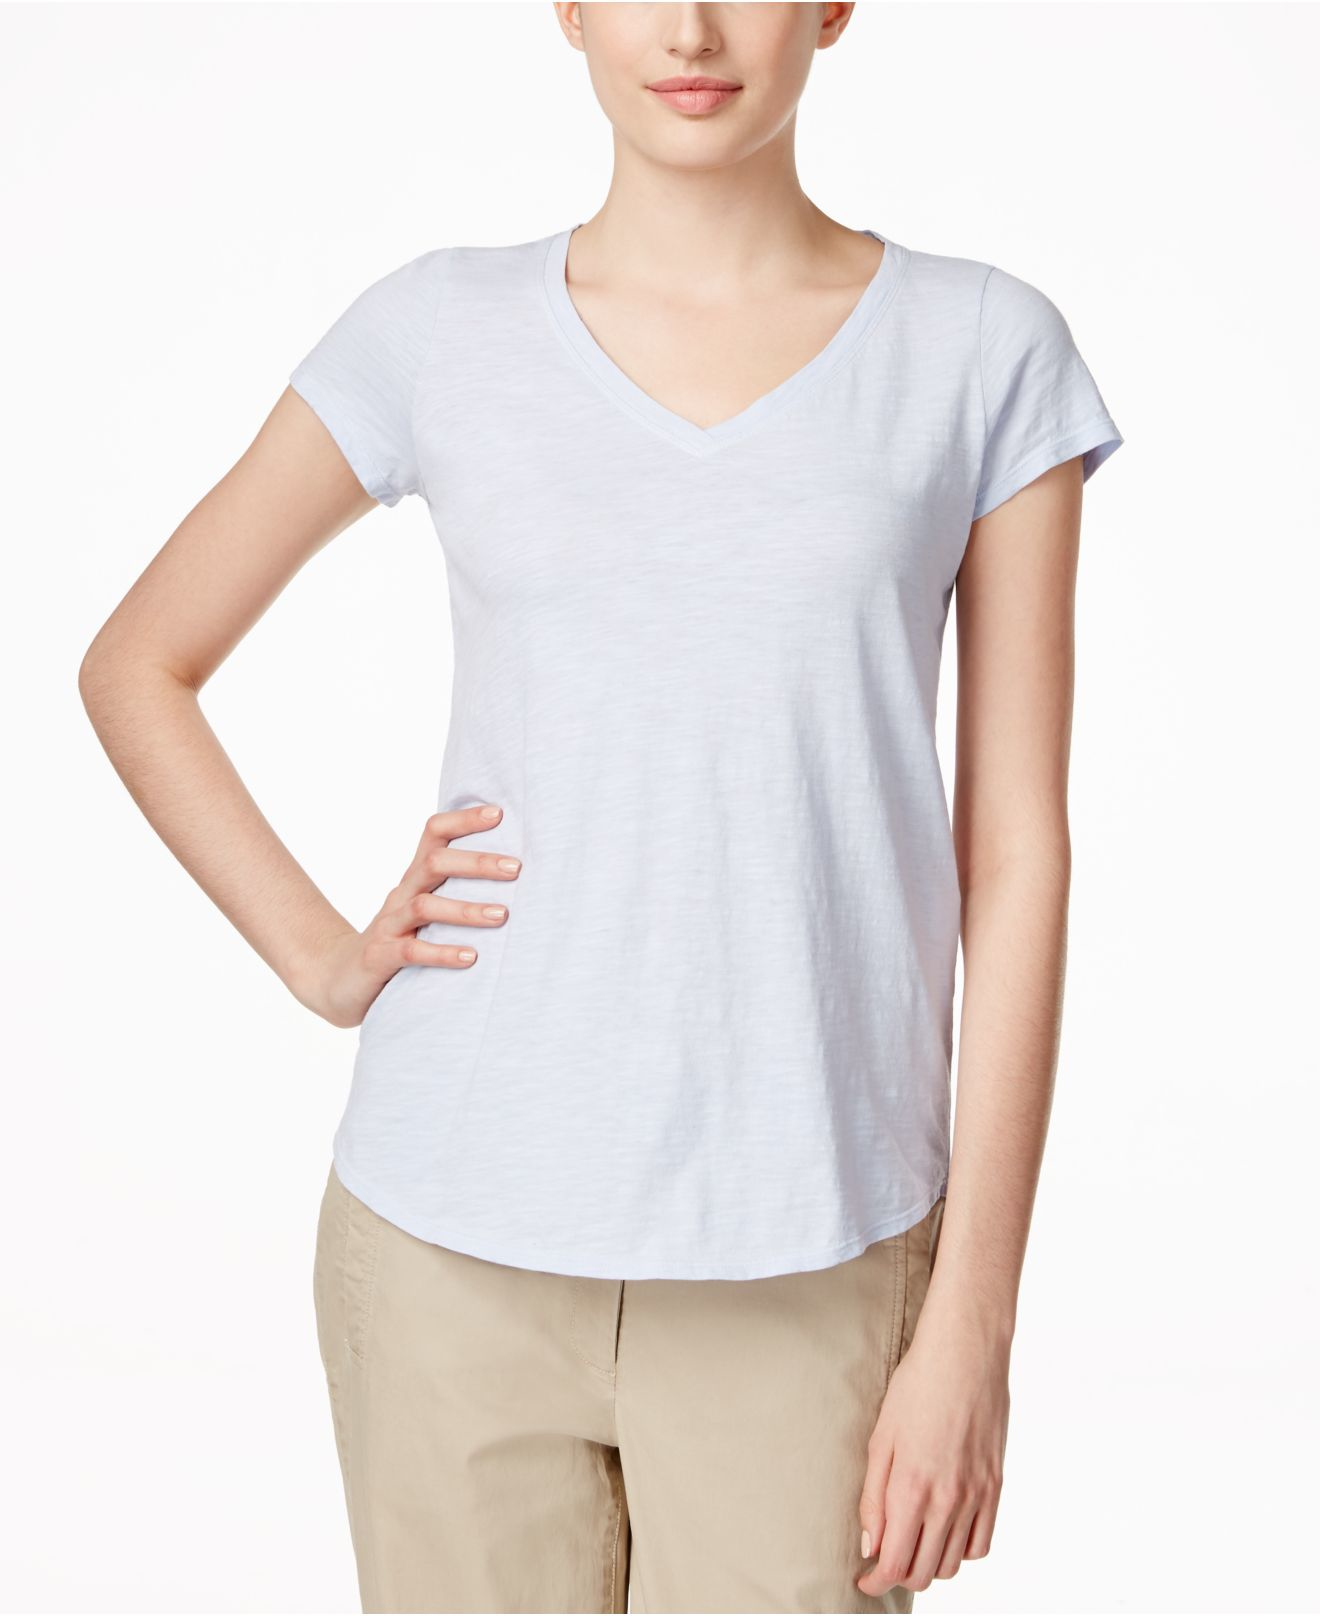 eileen fisher v neck t shirt in white lyst